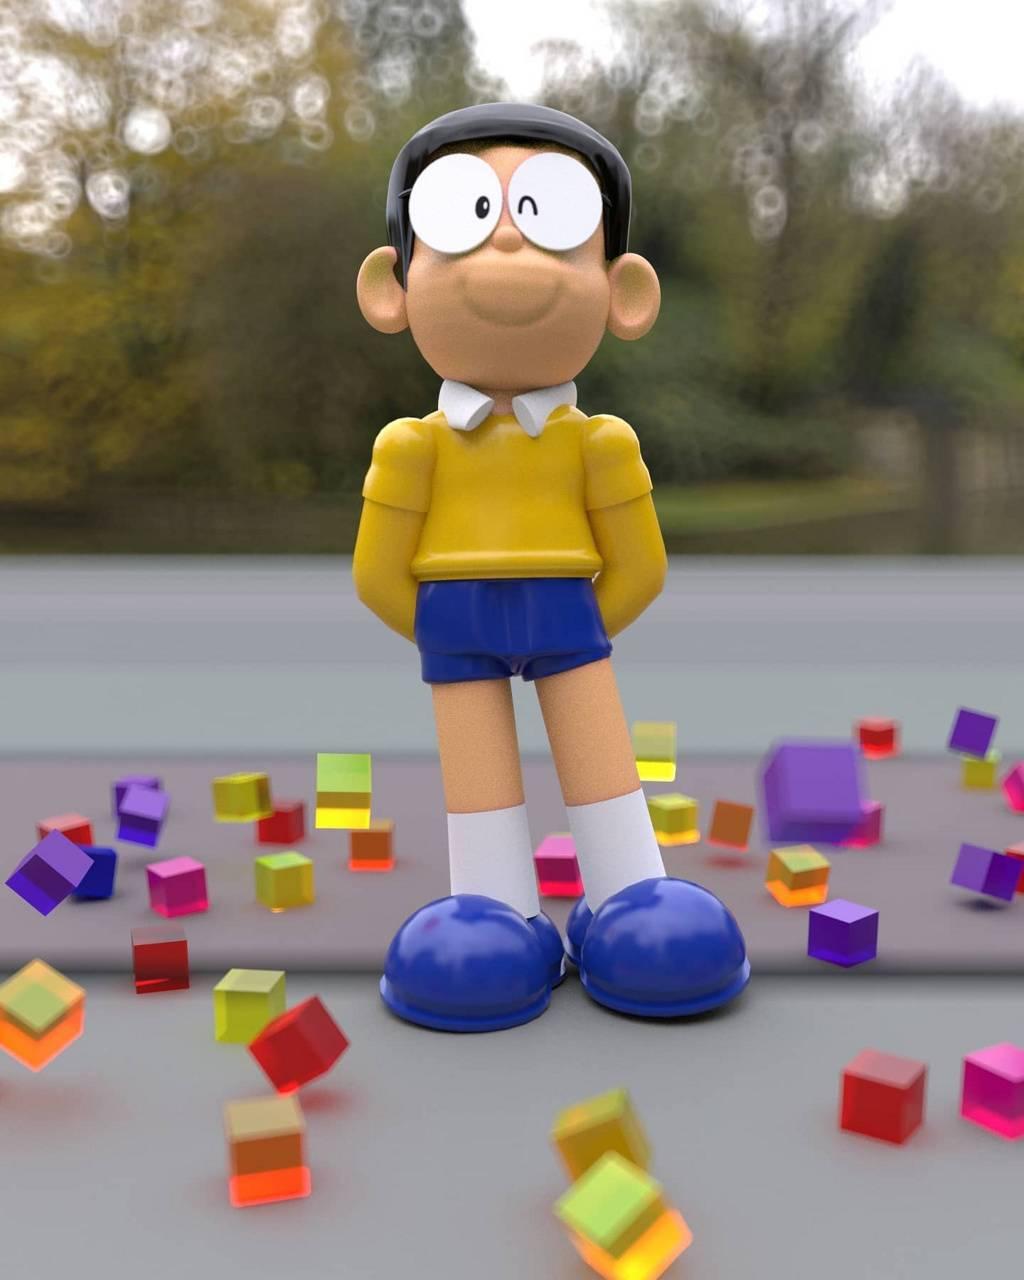 Nobita illustration